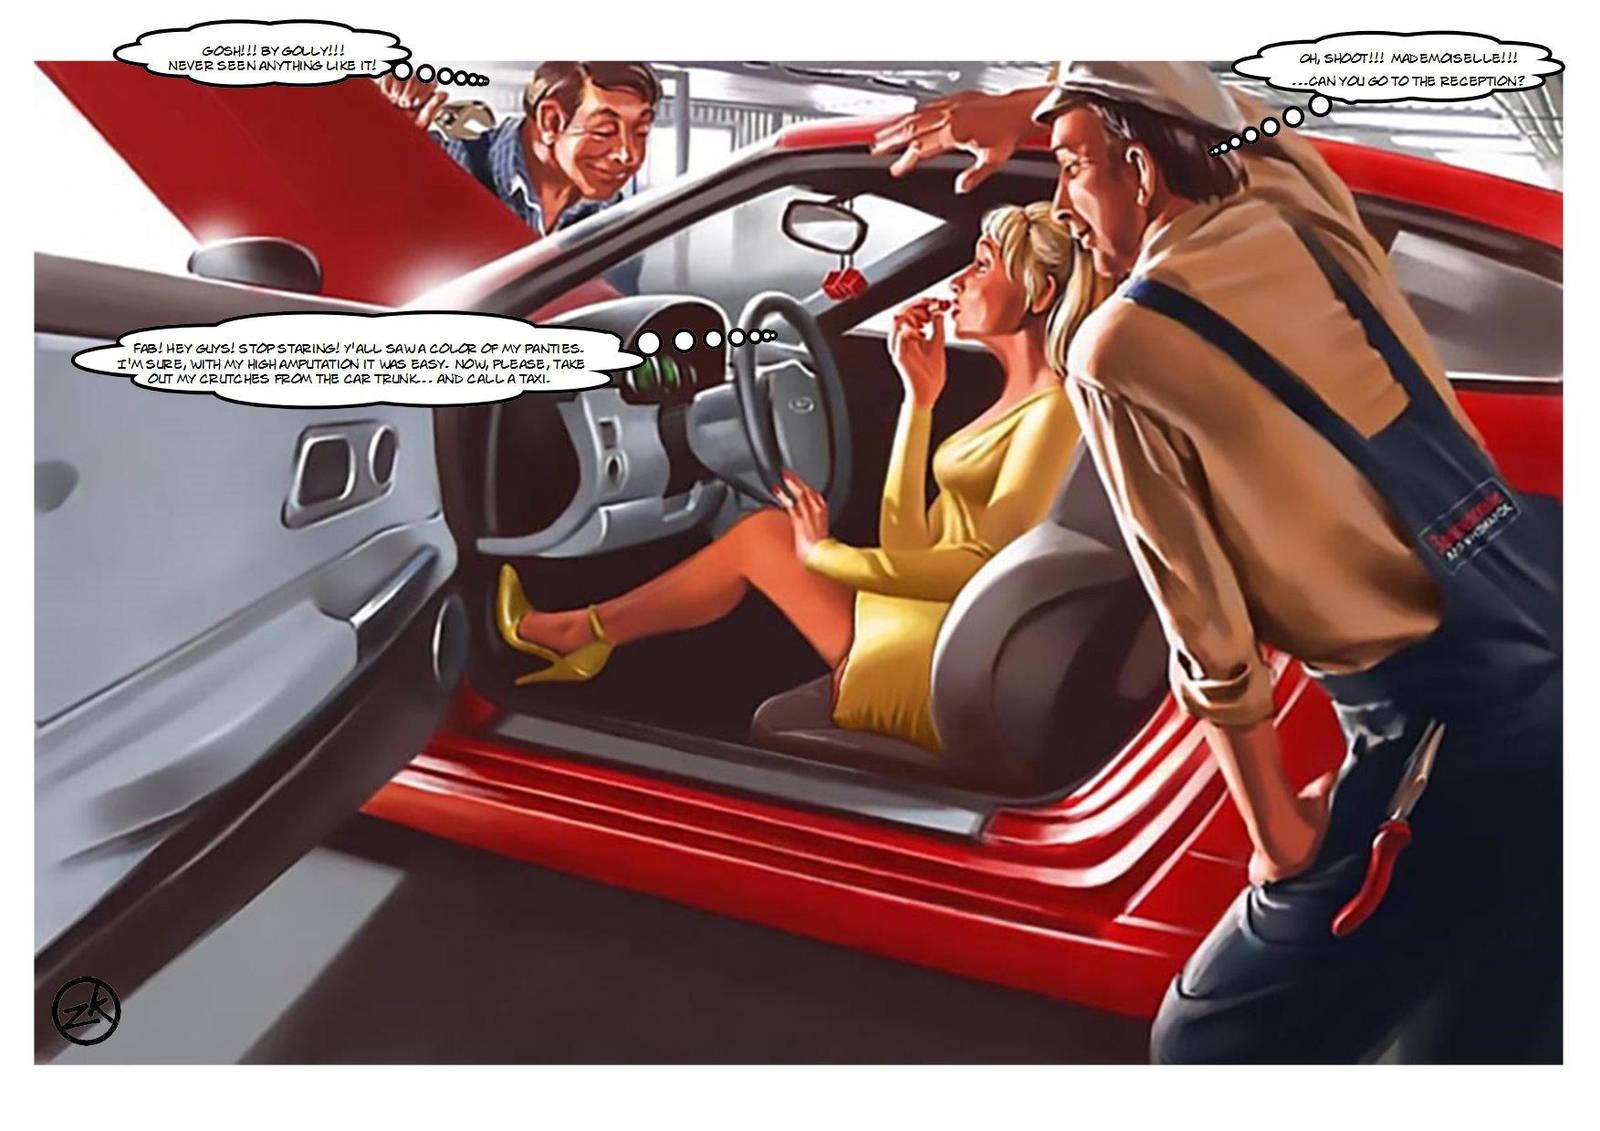 Car Service (Amputee Fantasy With V.Barykin) By Bordoler